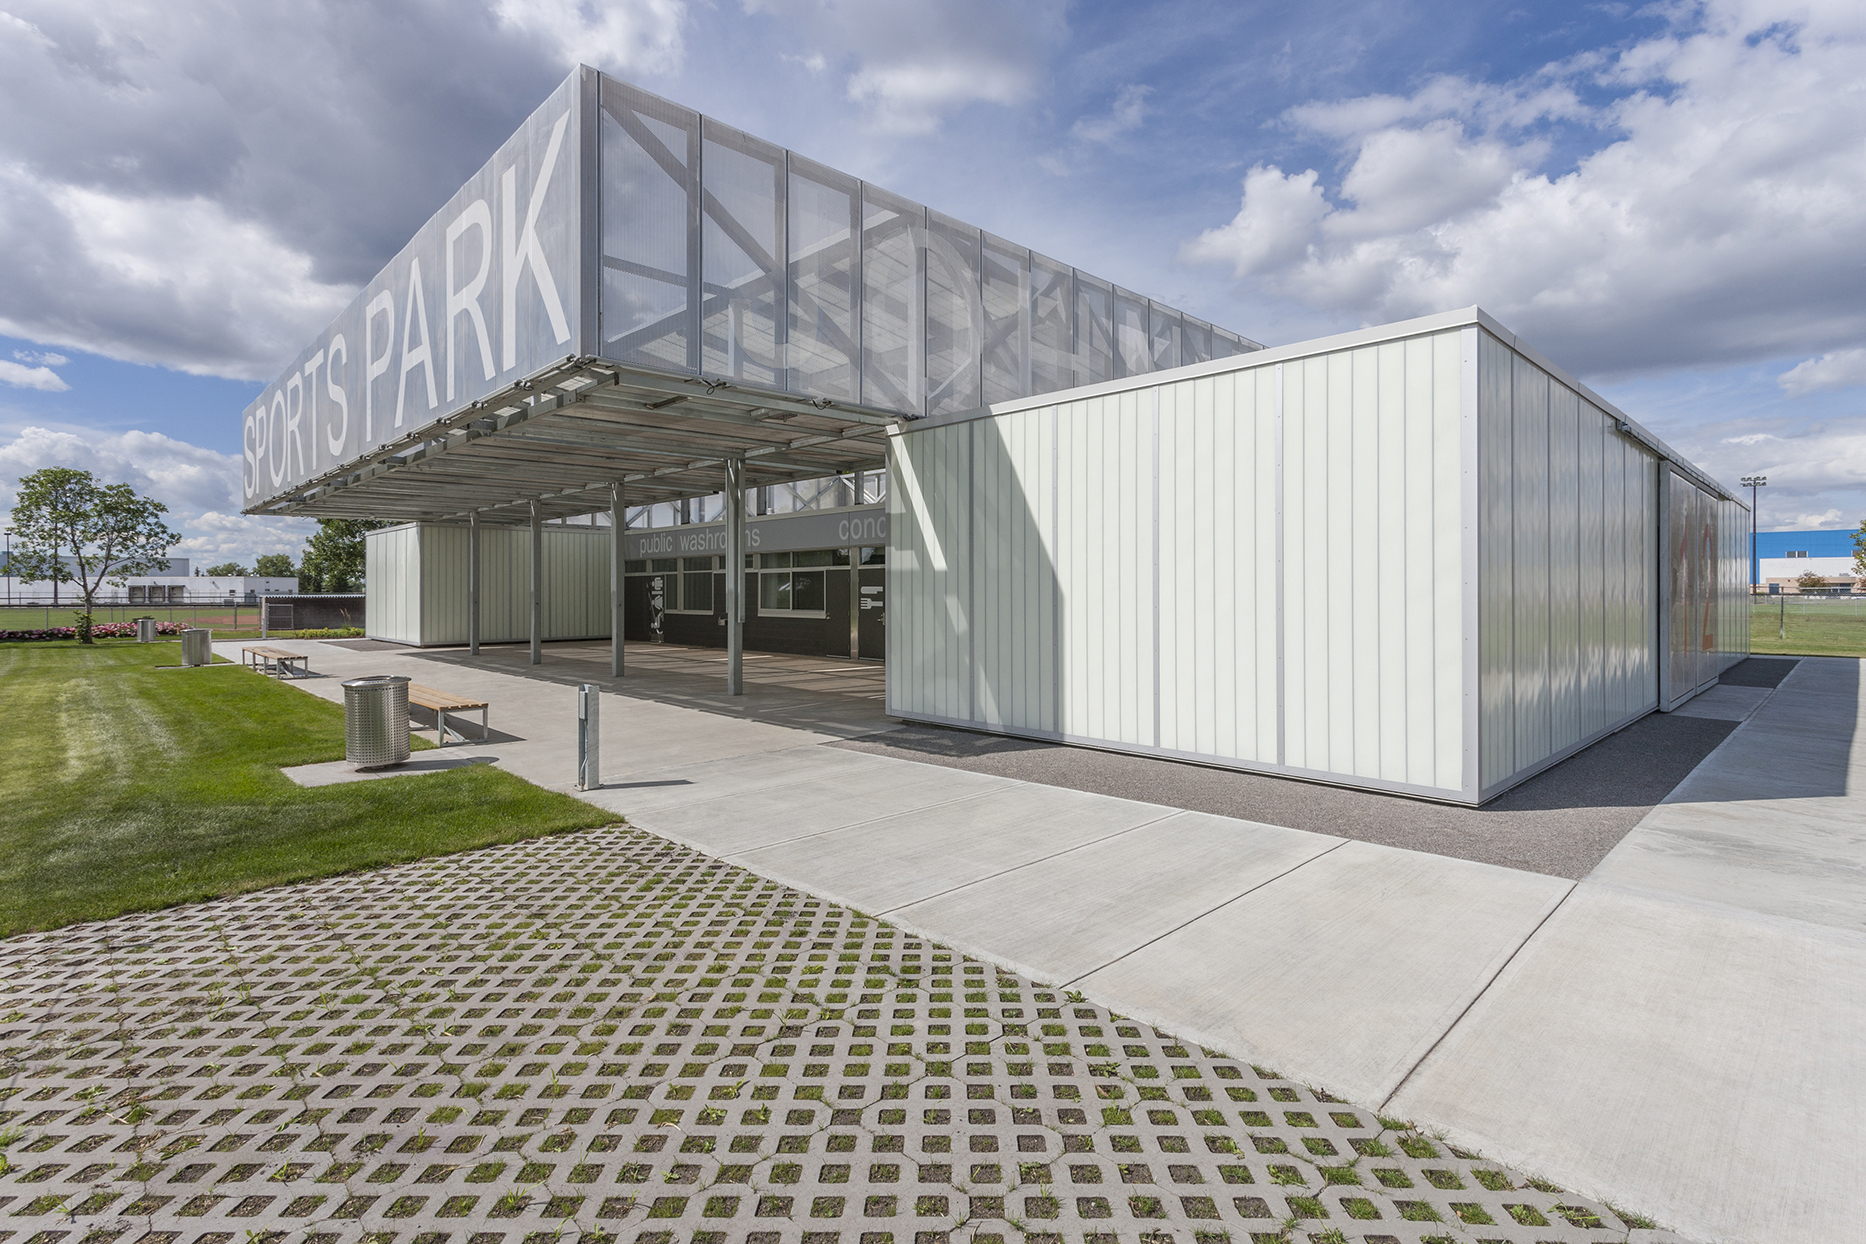 John Fry Sports Park Pavilion / The Marc Boutin